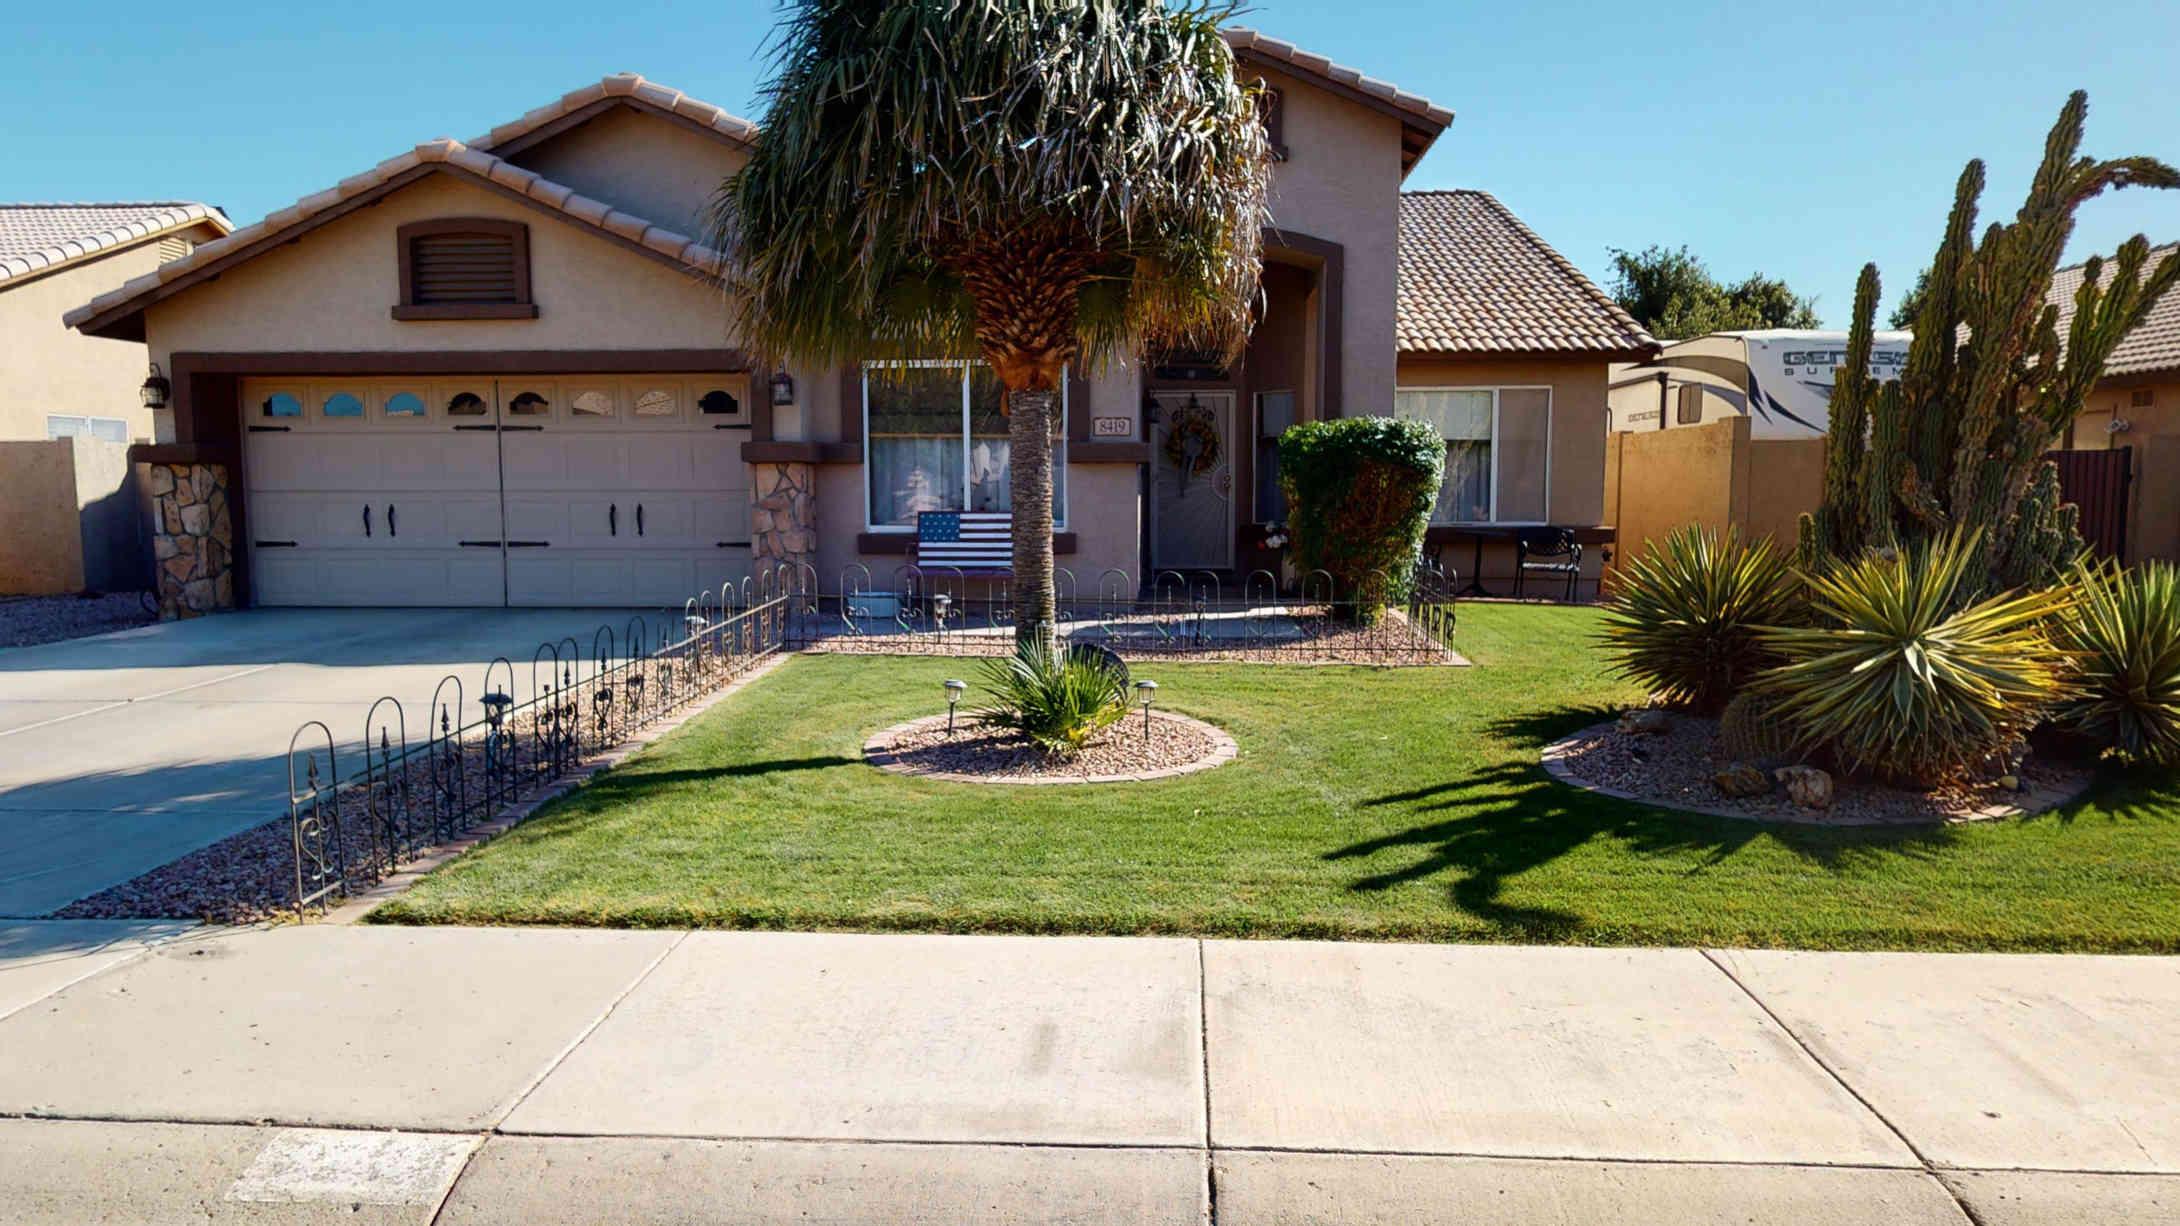 8419 W SHAW BUTTE Drive, Peoria, AZ, 85345,